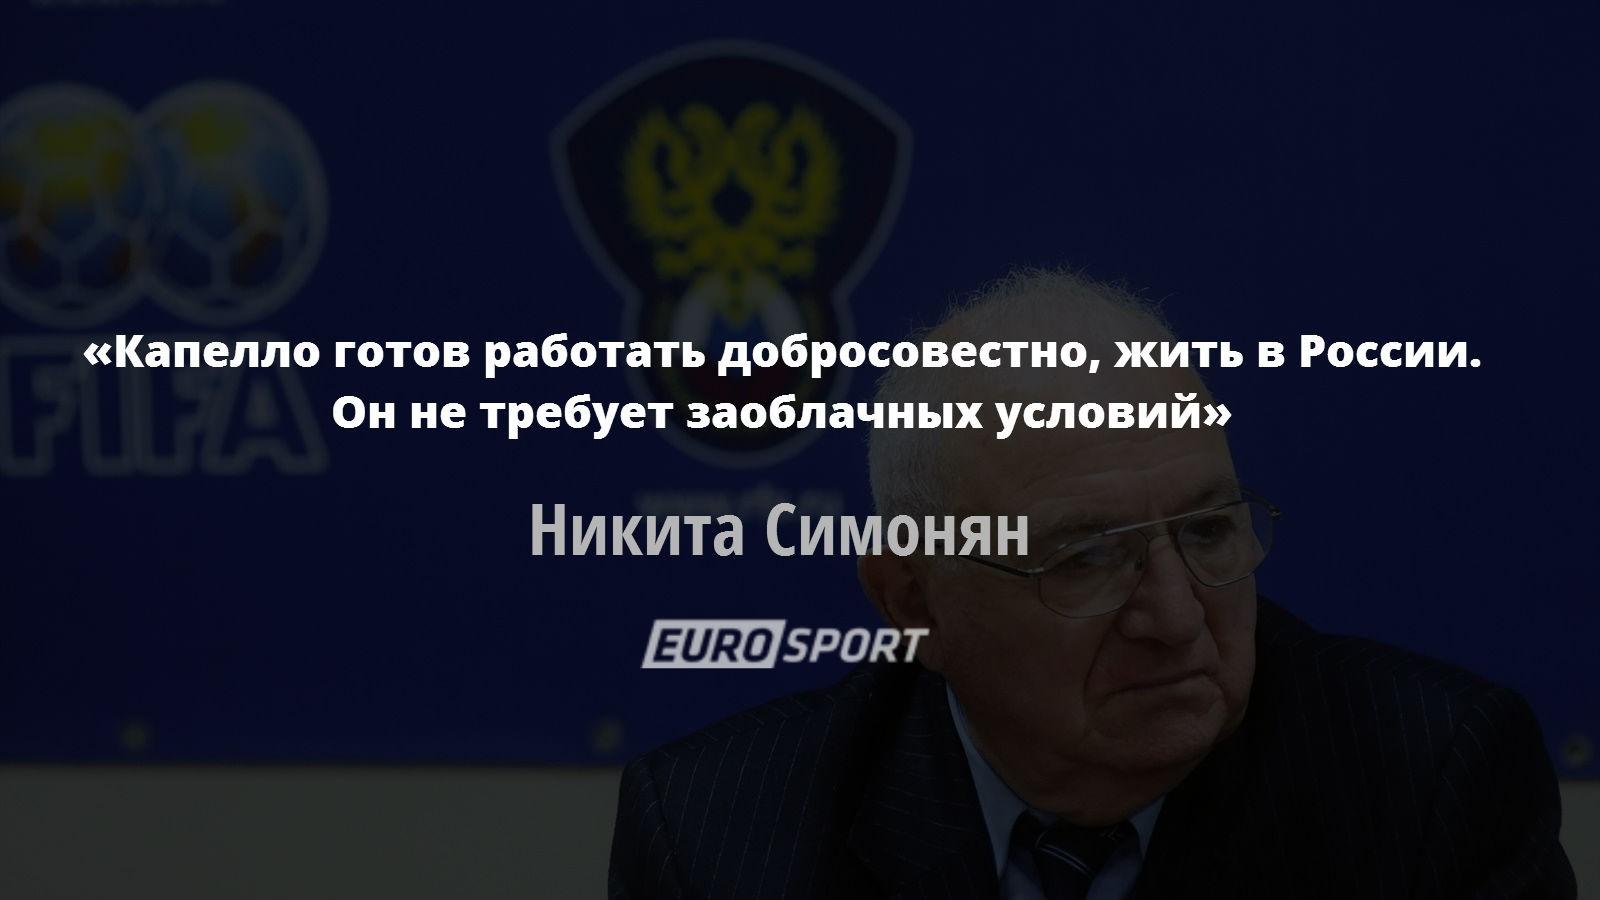 https://i.eurosport.com/2015/07/13/1639111.jpg